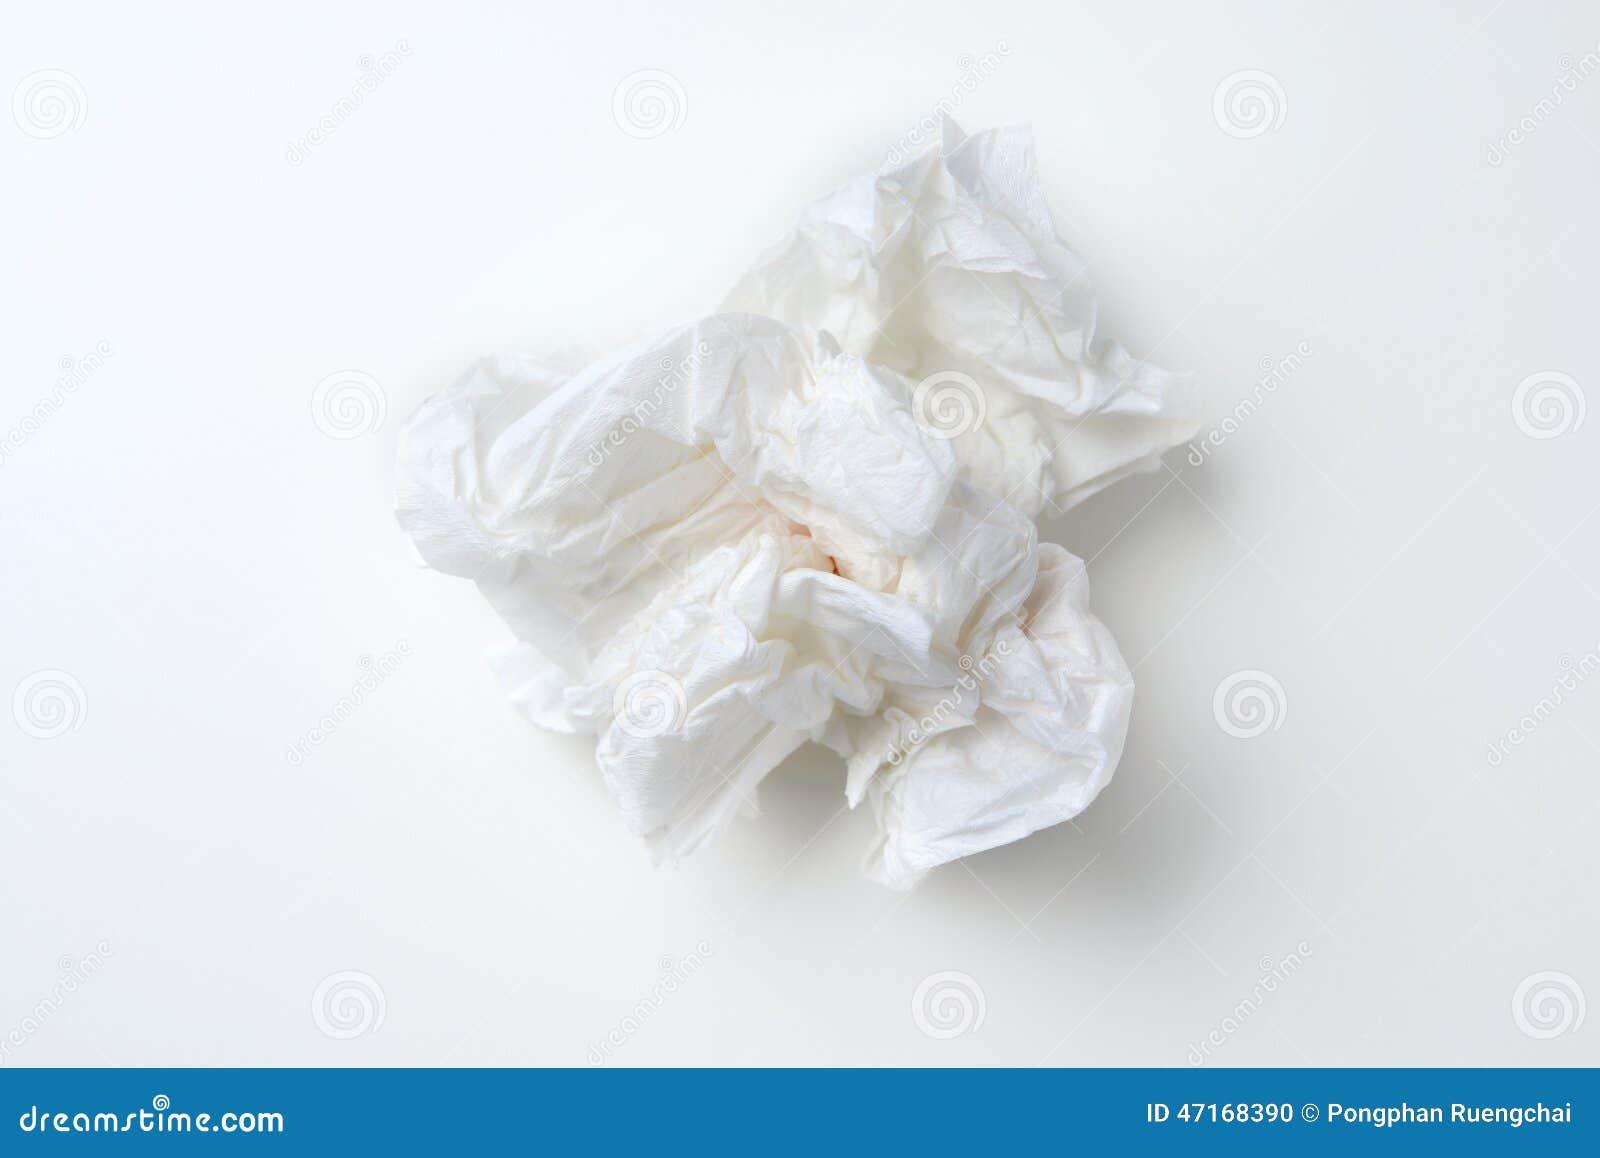 Crumpled Tissue Stock Photo Image 47168390